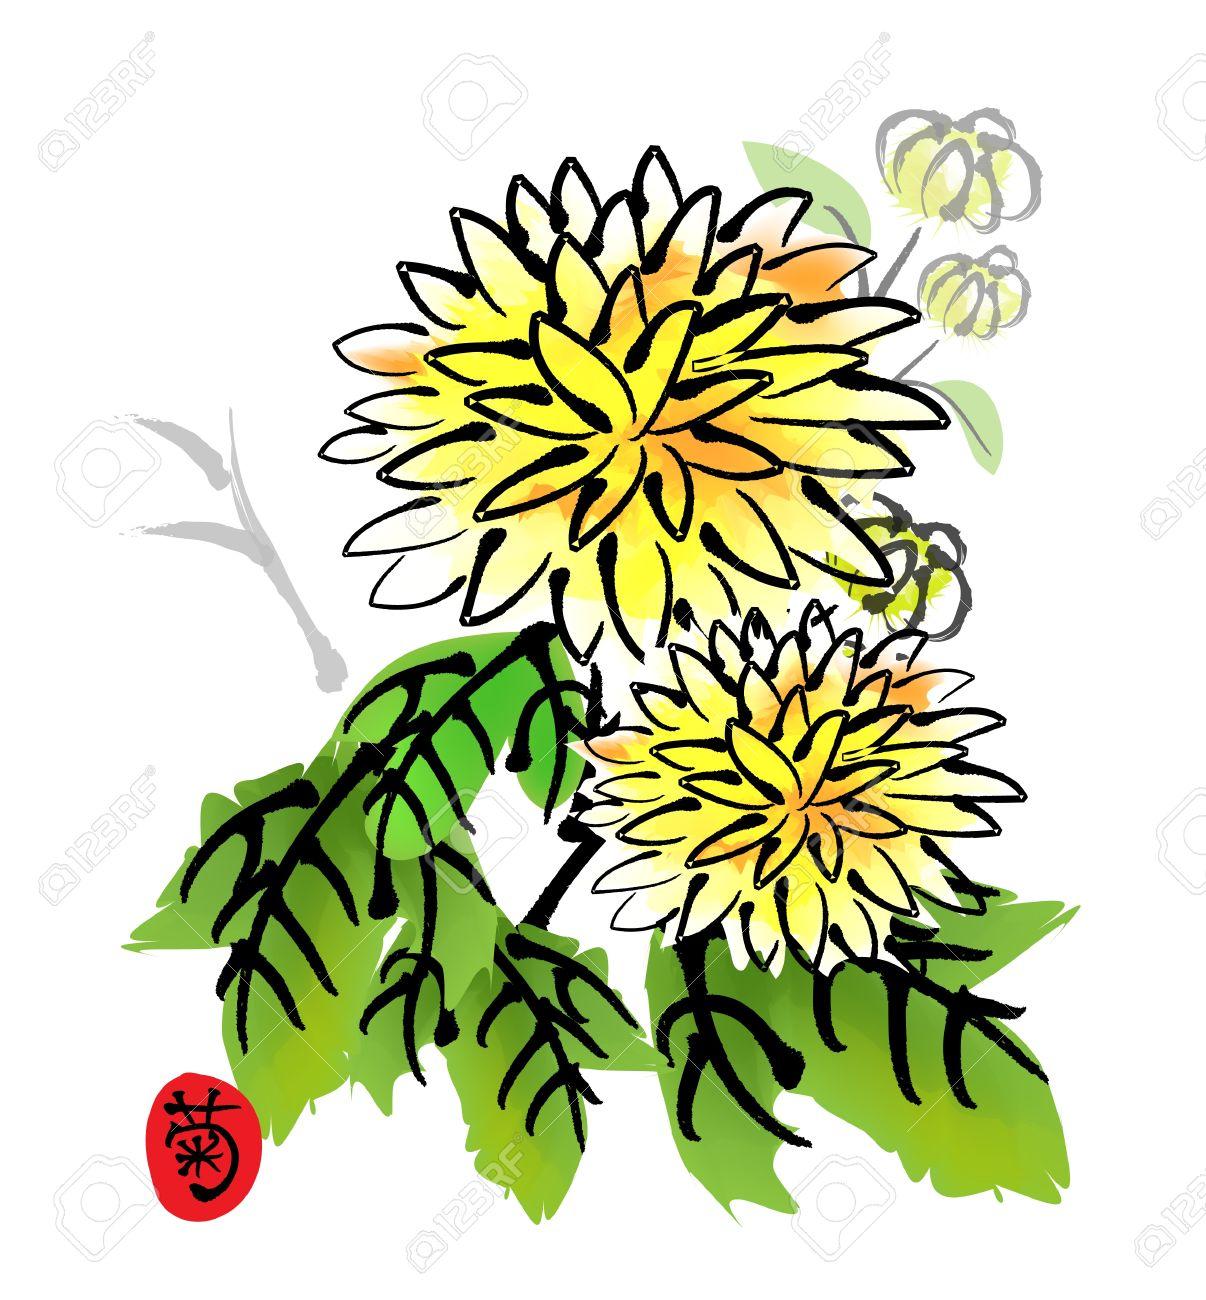 chinese style traditional painting - Chrysanthemum Stock Photo - 10828318